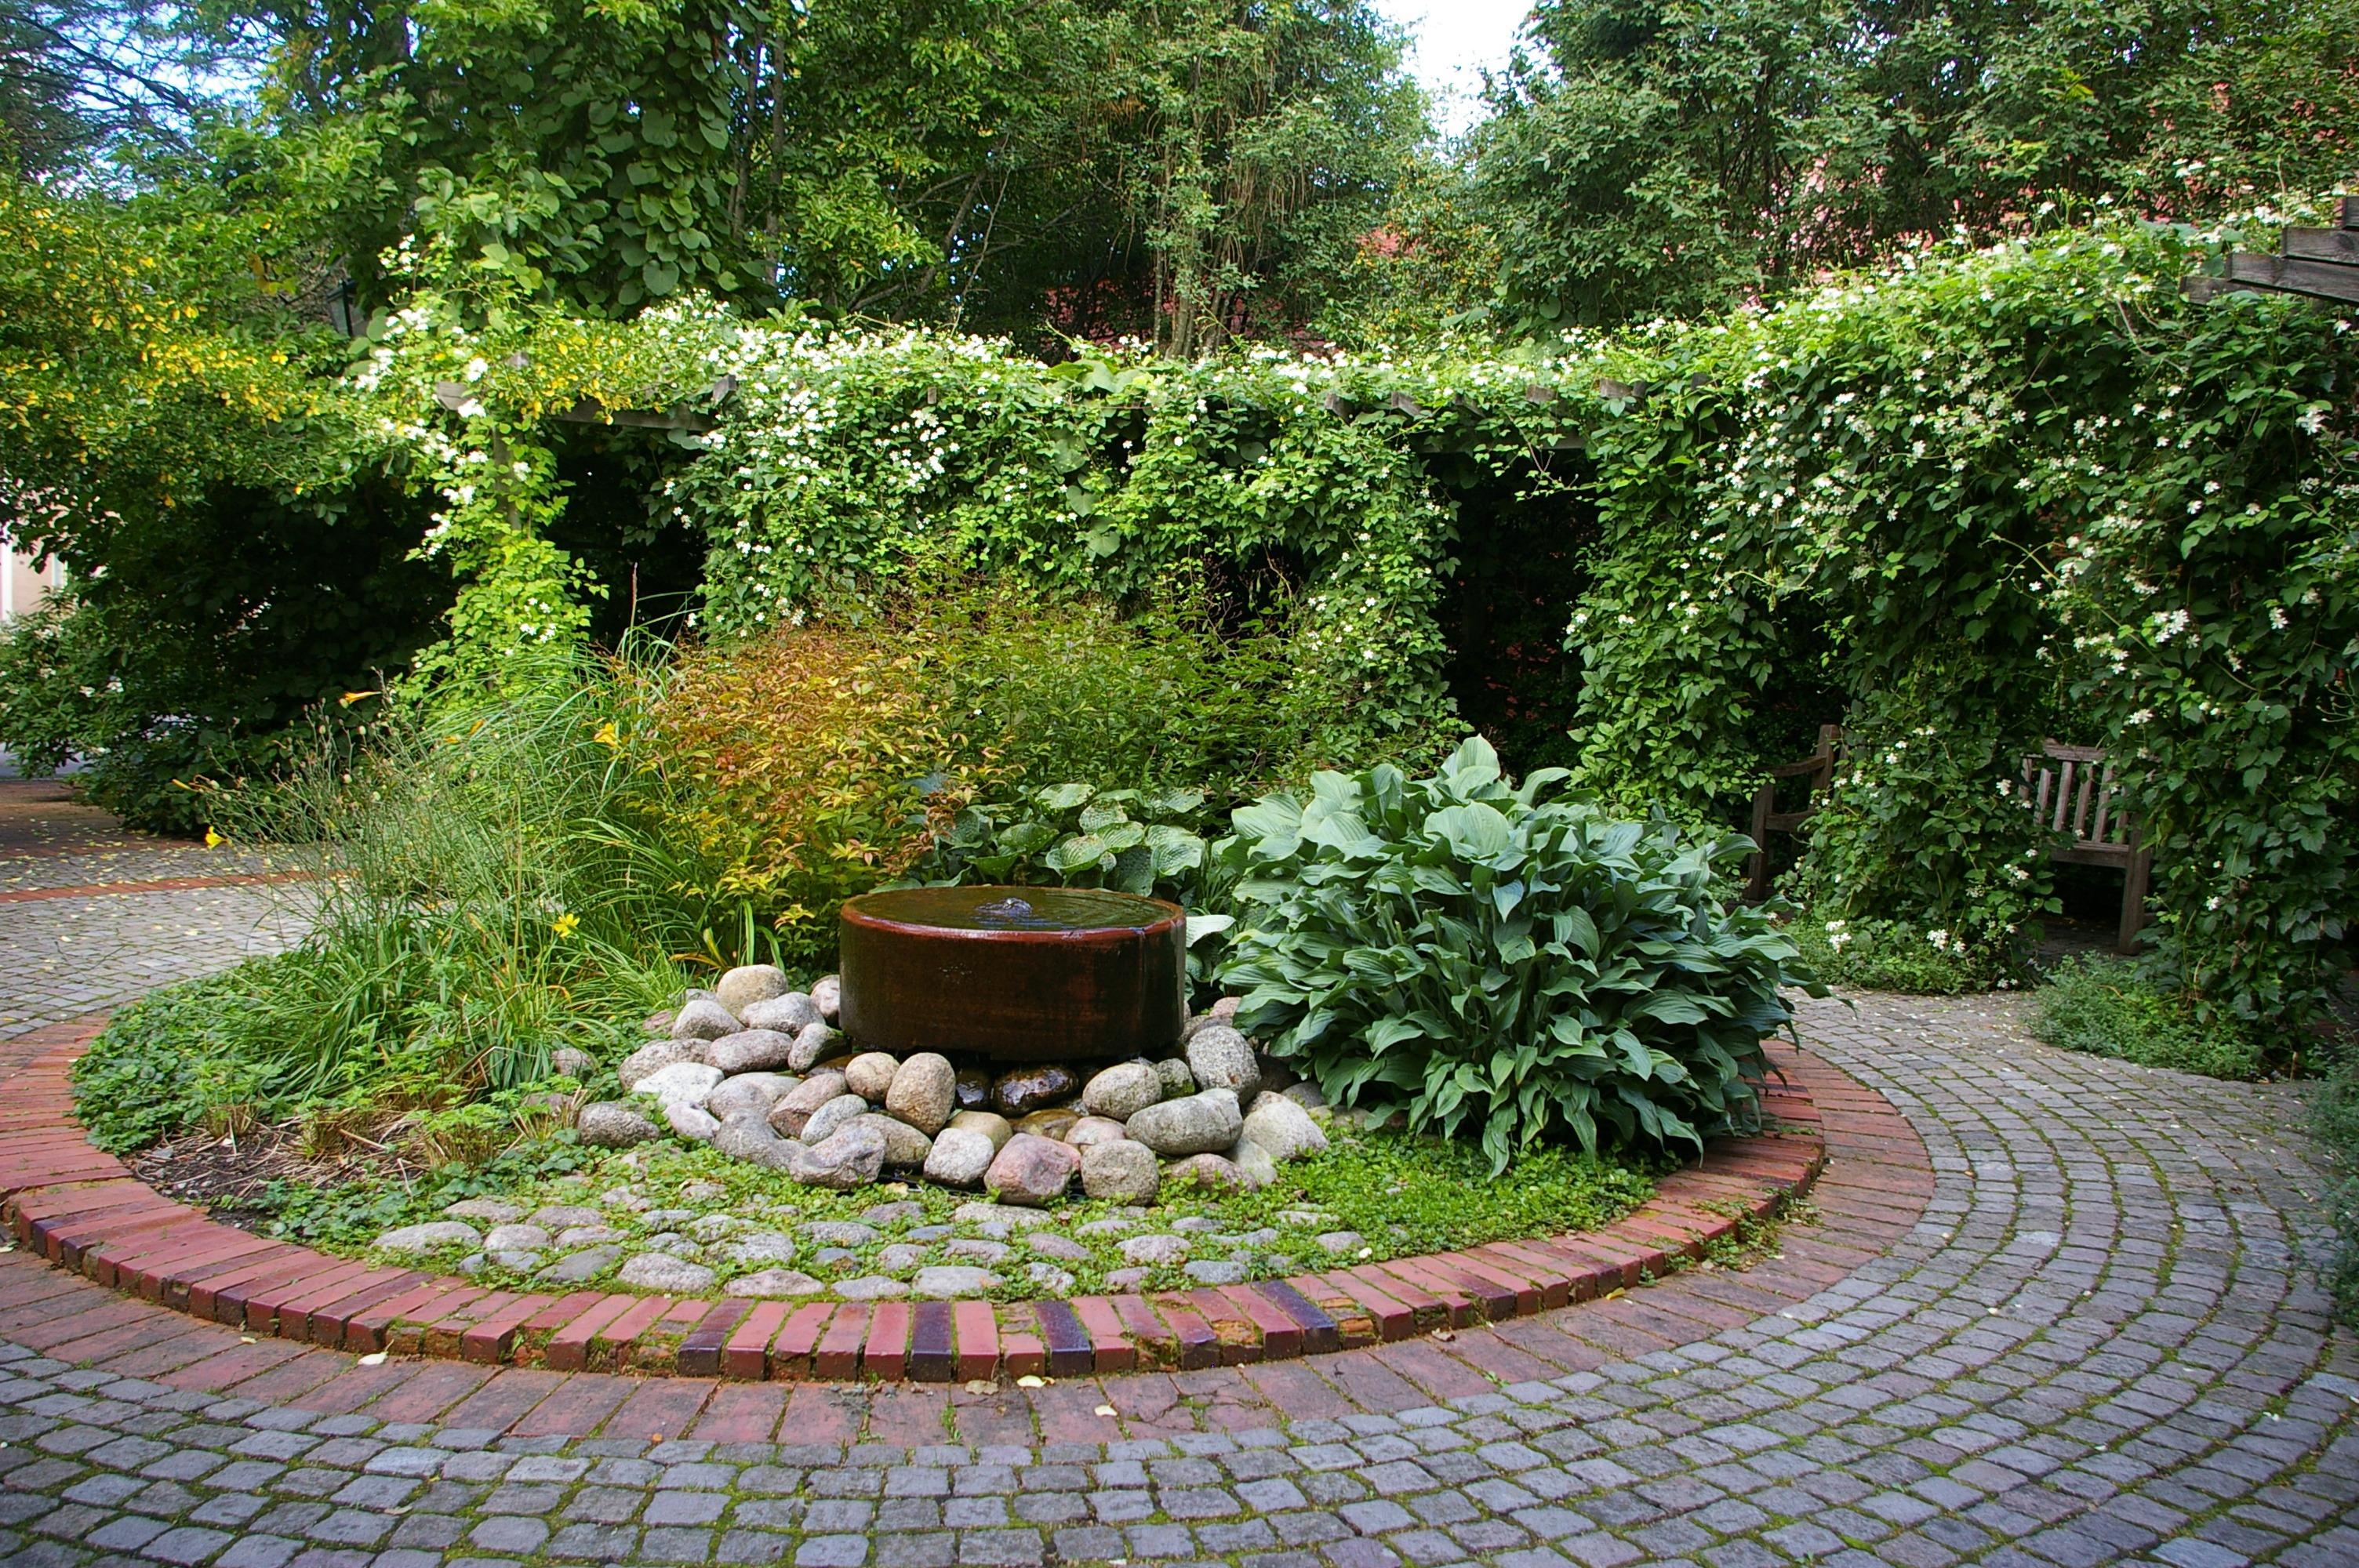 free images lawn leaf walkway pond green park backyard